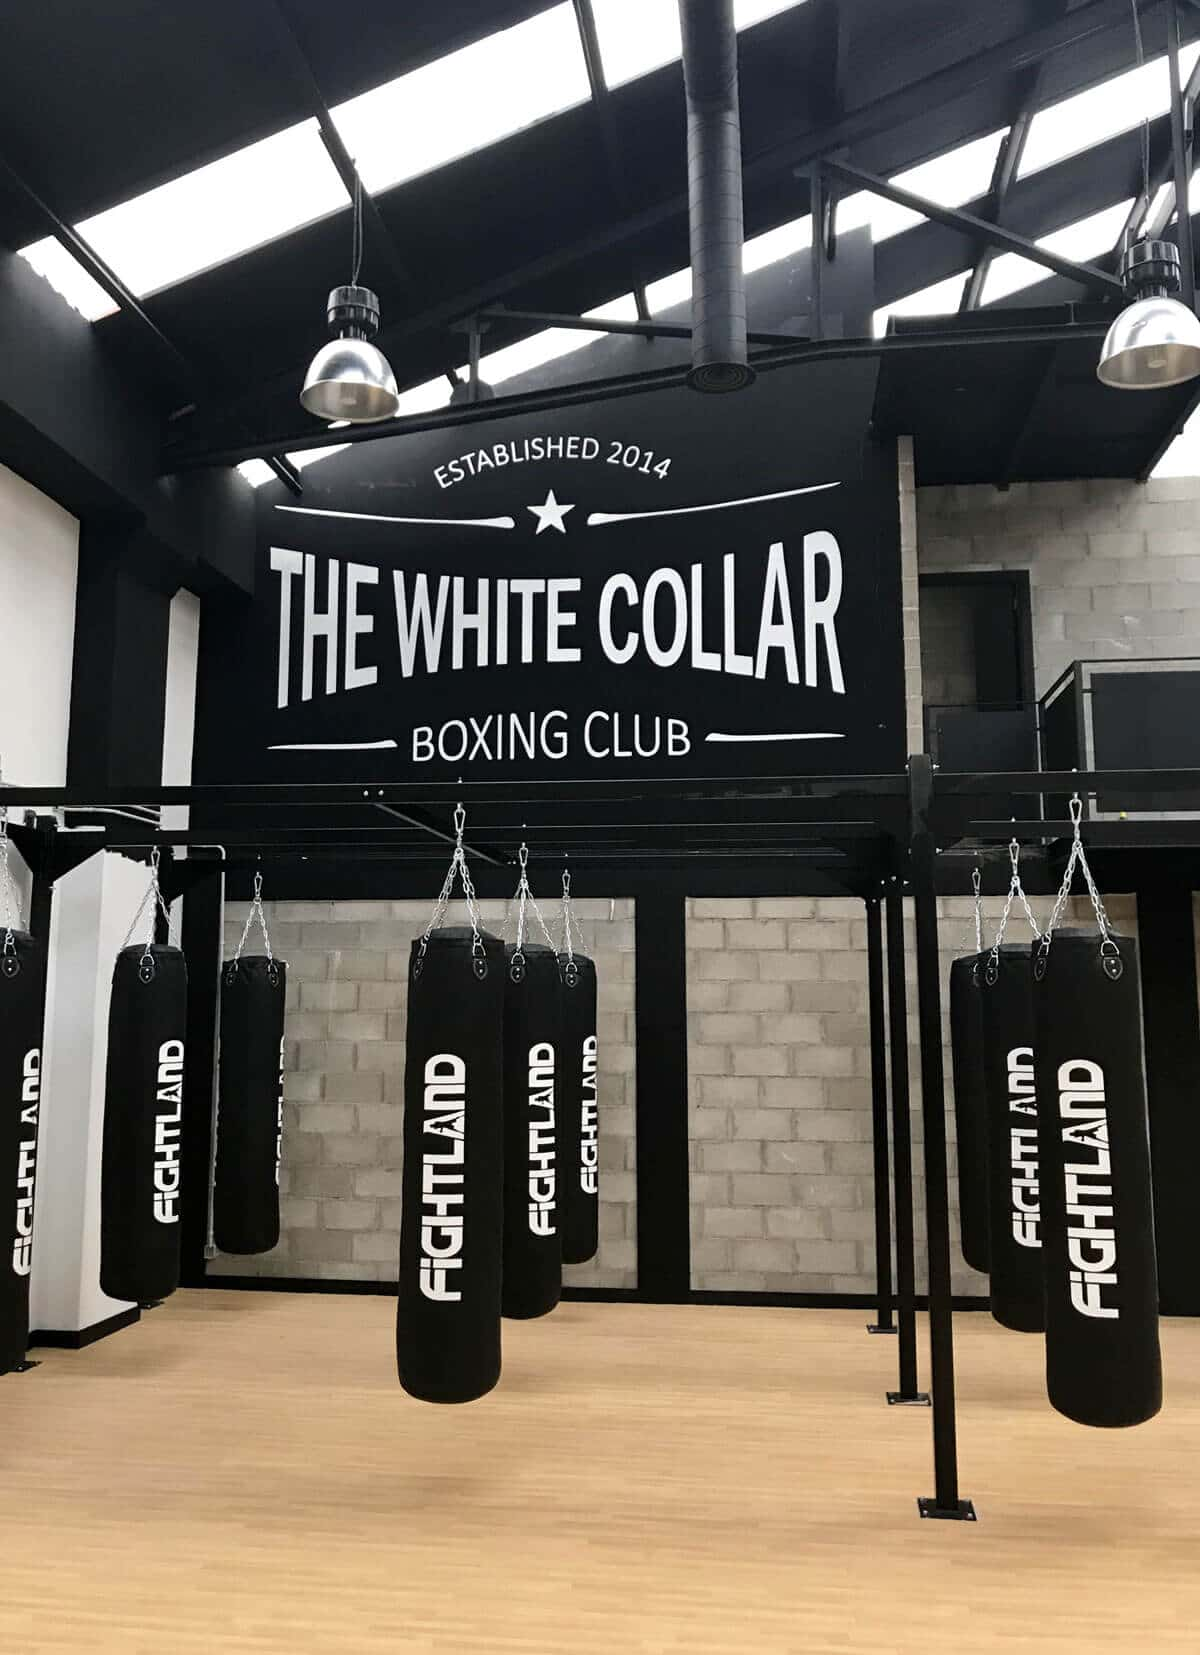 Fightland - Club Boxeo - Hermosilla